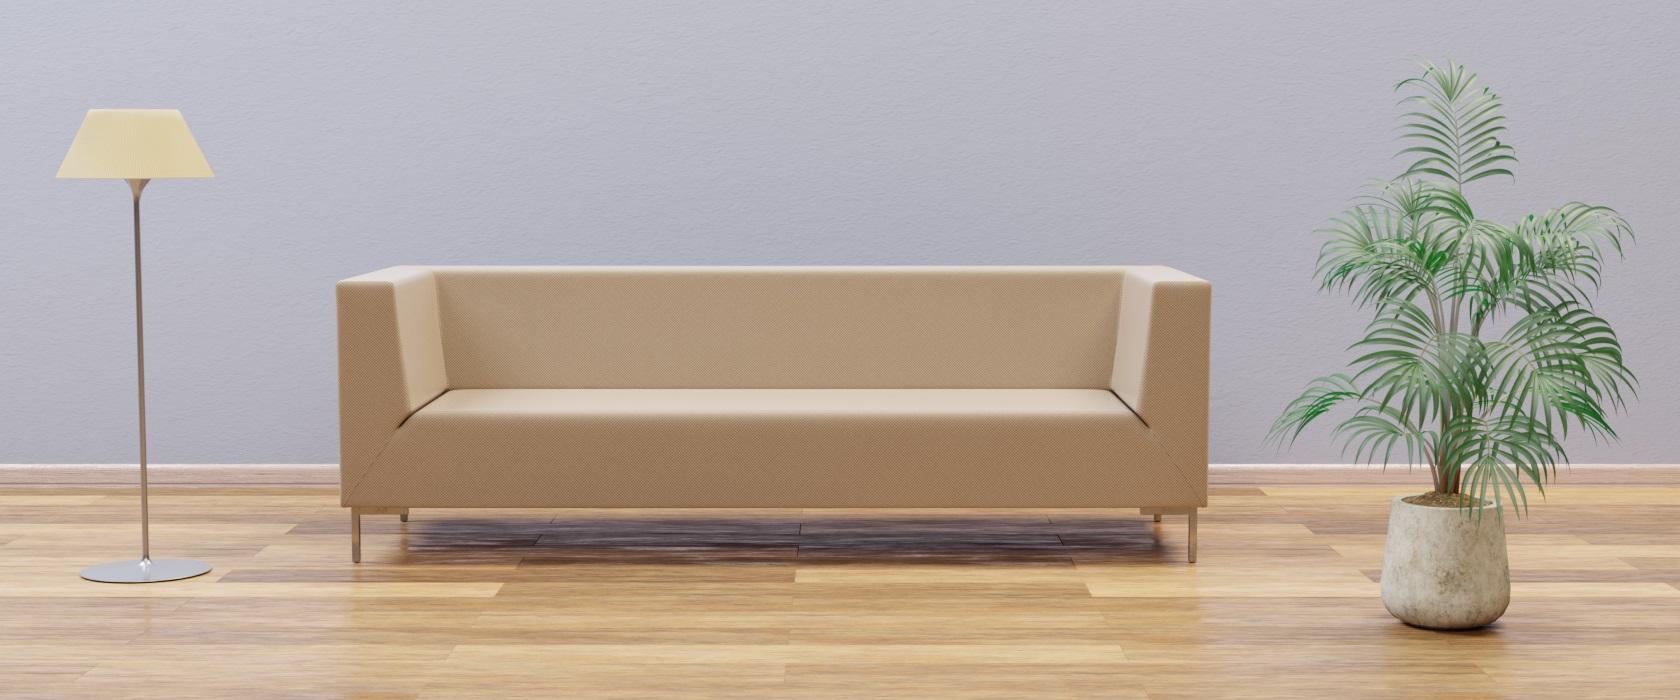 Трехместный диван Livorno Club - Фото 2 - Pufetto